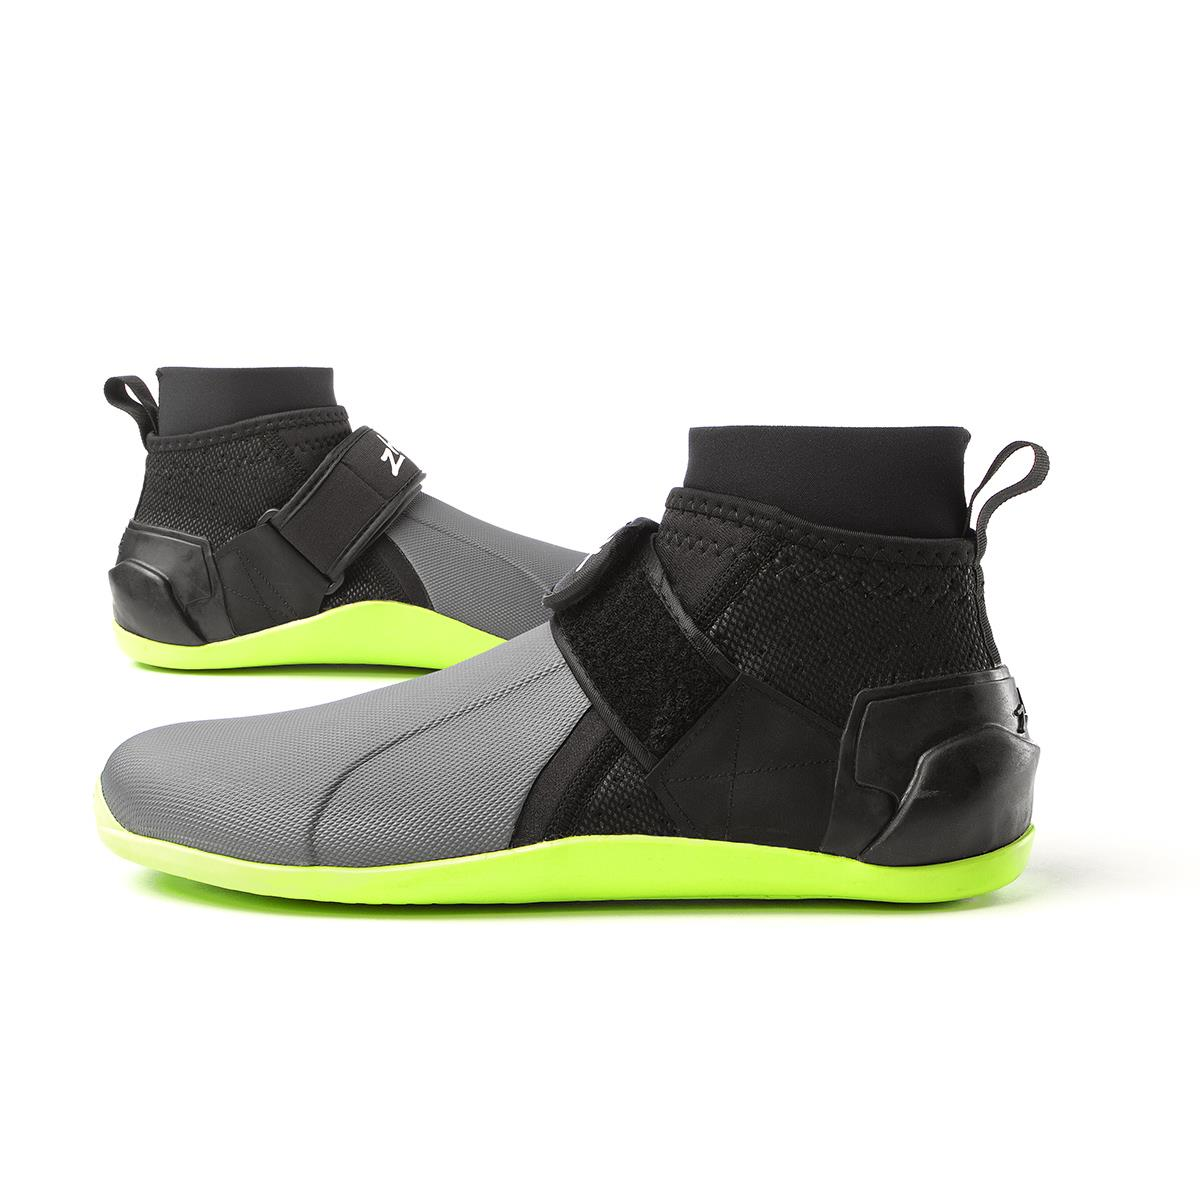 Zhik 170 sailing boots